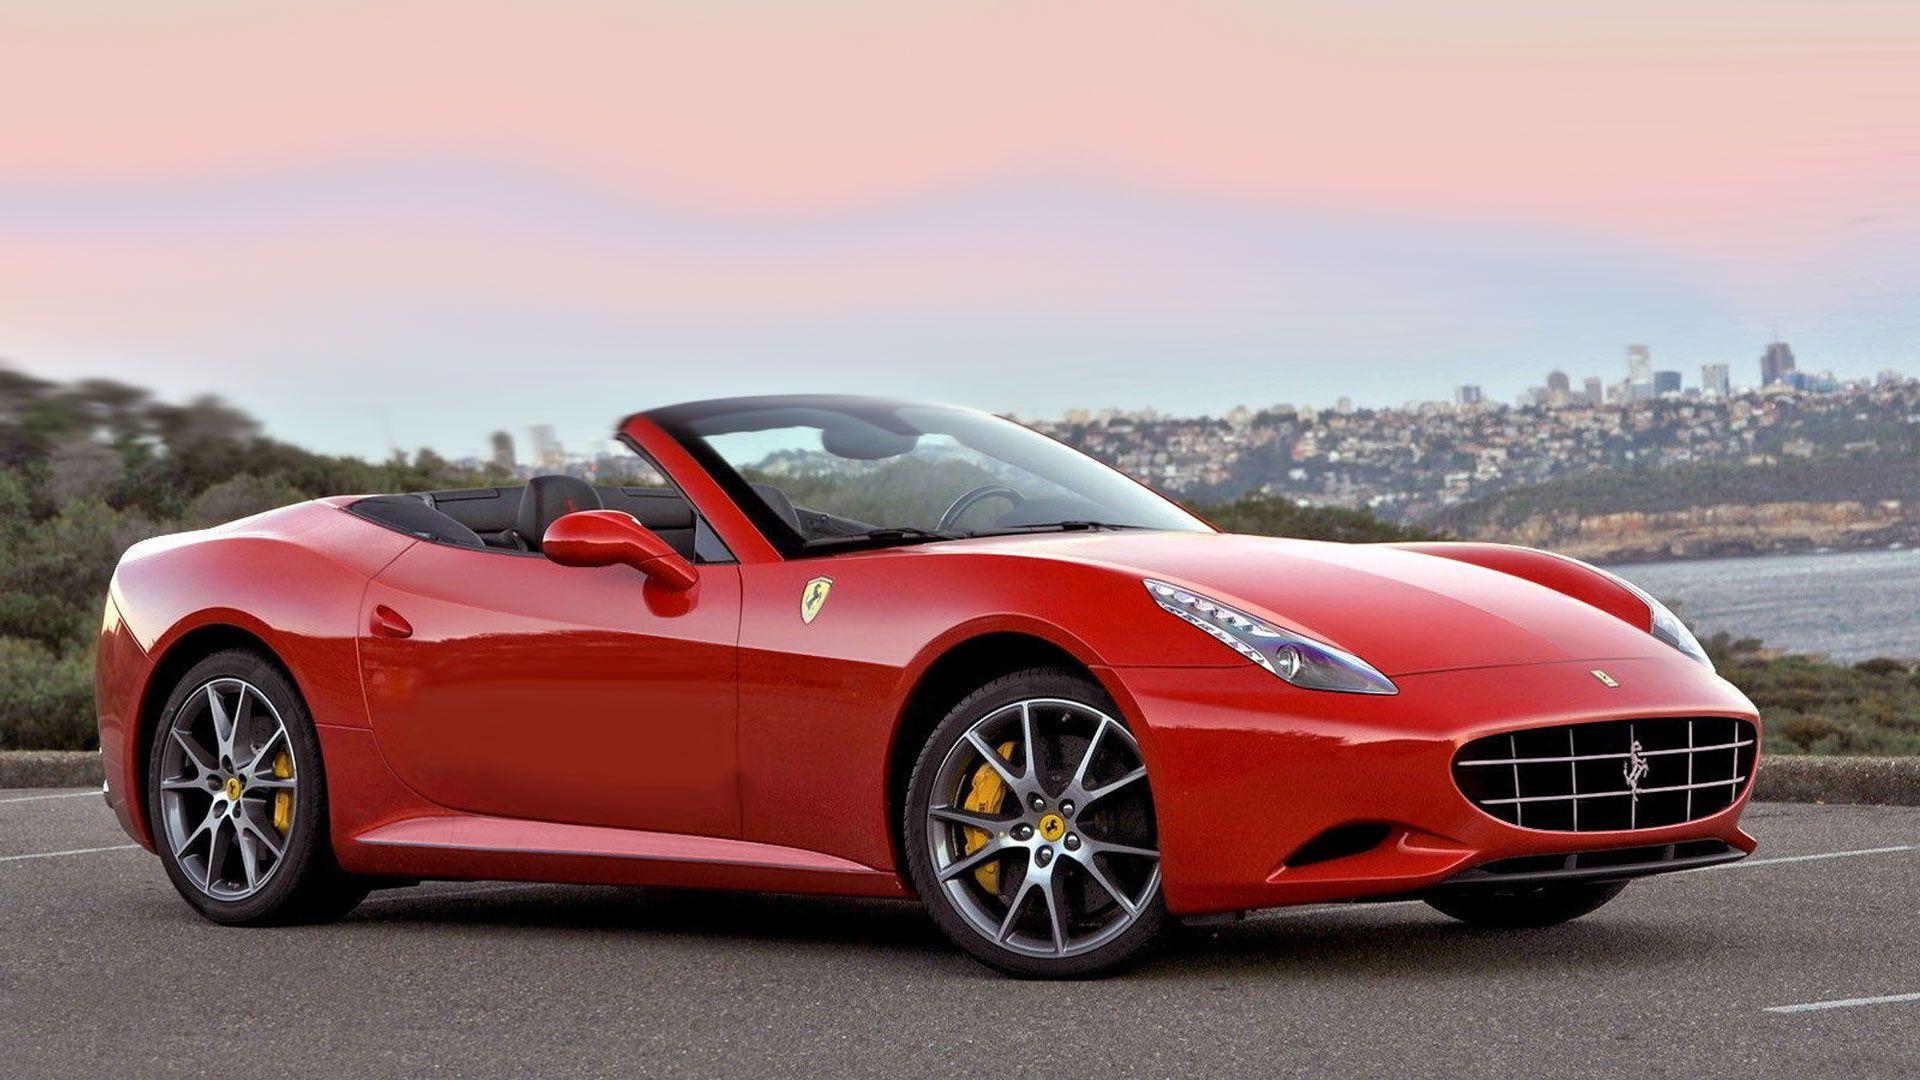 Ferrari california car wallpapers httphdcarwallfxferrari ferrari california car wallpapers httphdcarwallfxferrari california voltagebd Gallery